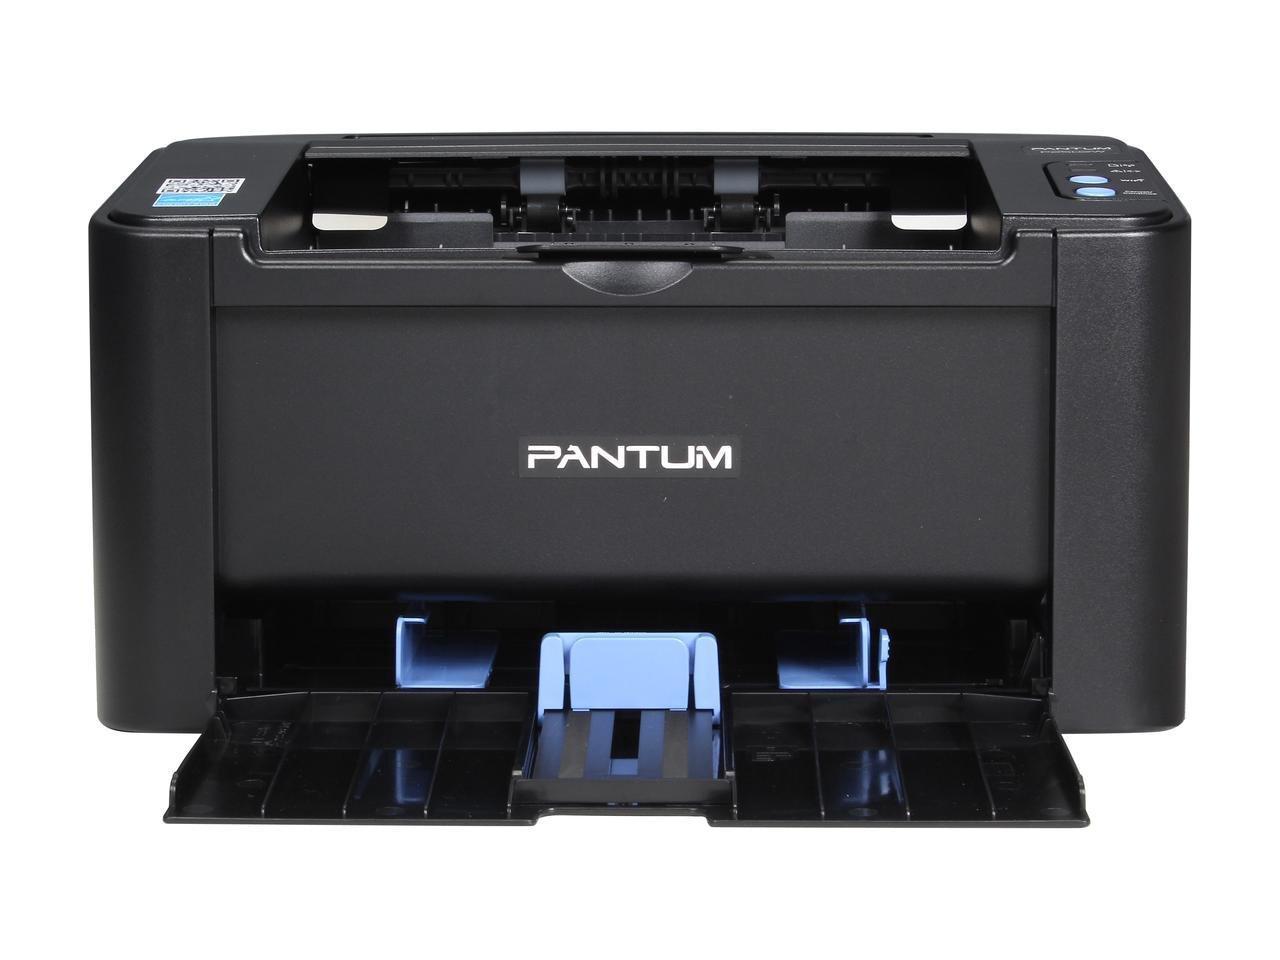 PANTUM P2502W Wireless Monochrome Laser Printer